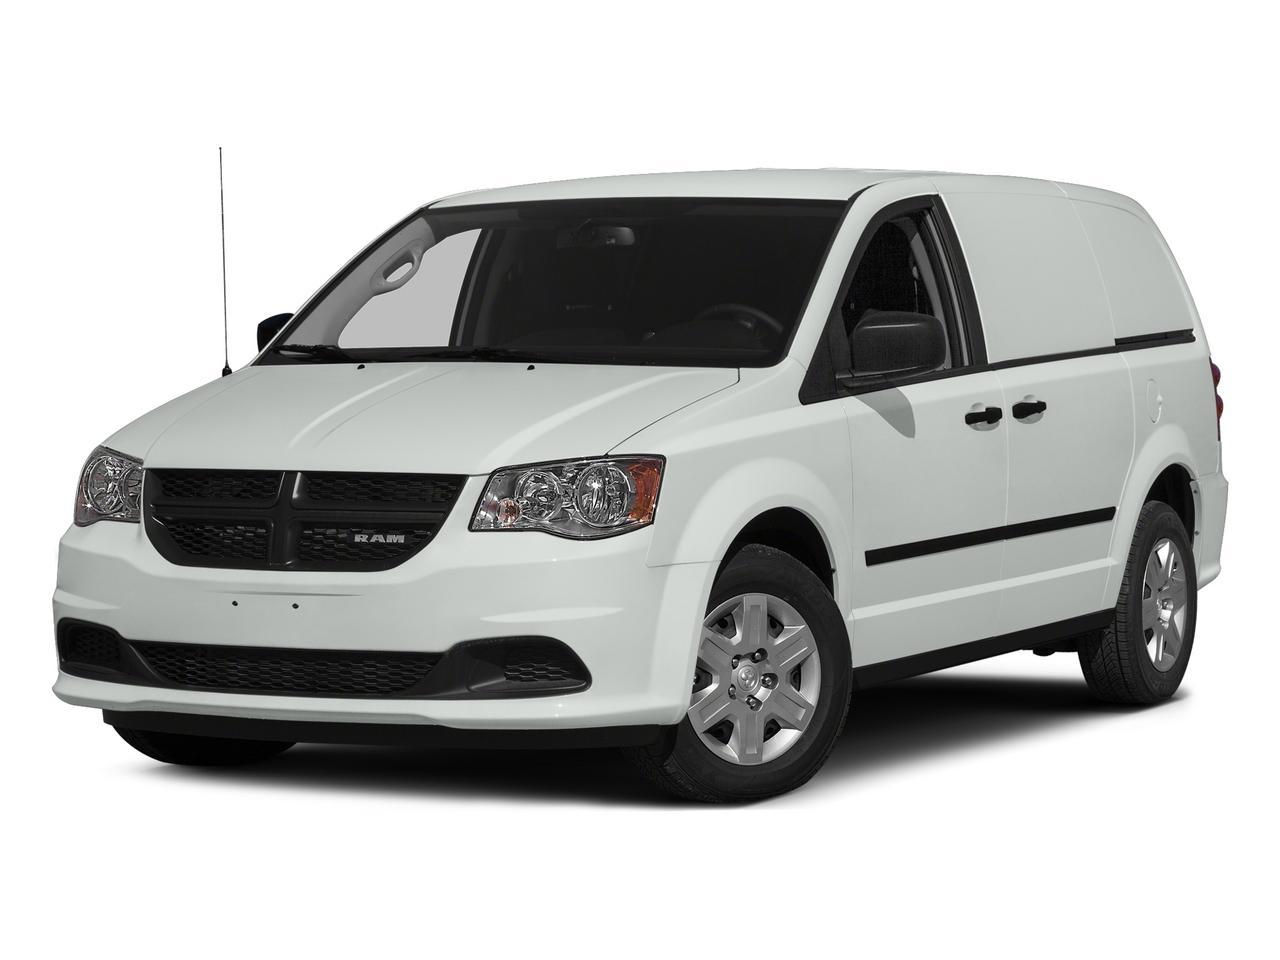 2015 Ram Cargo Van Vehicle Photo in Tulsa, OK 74133